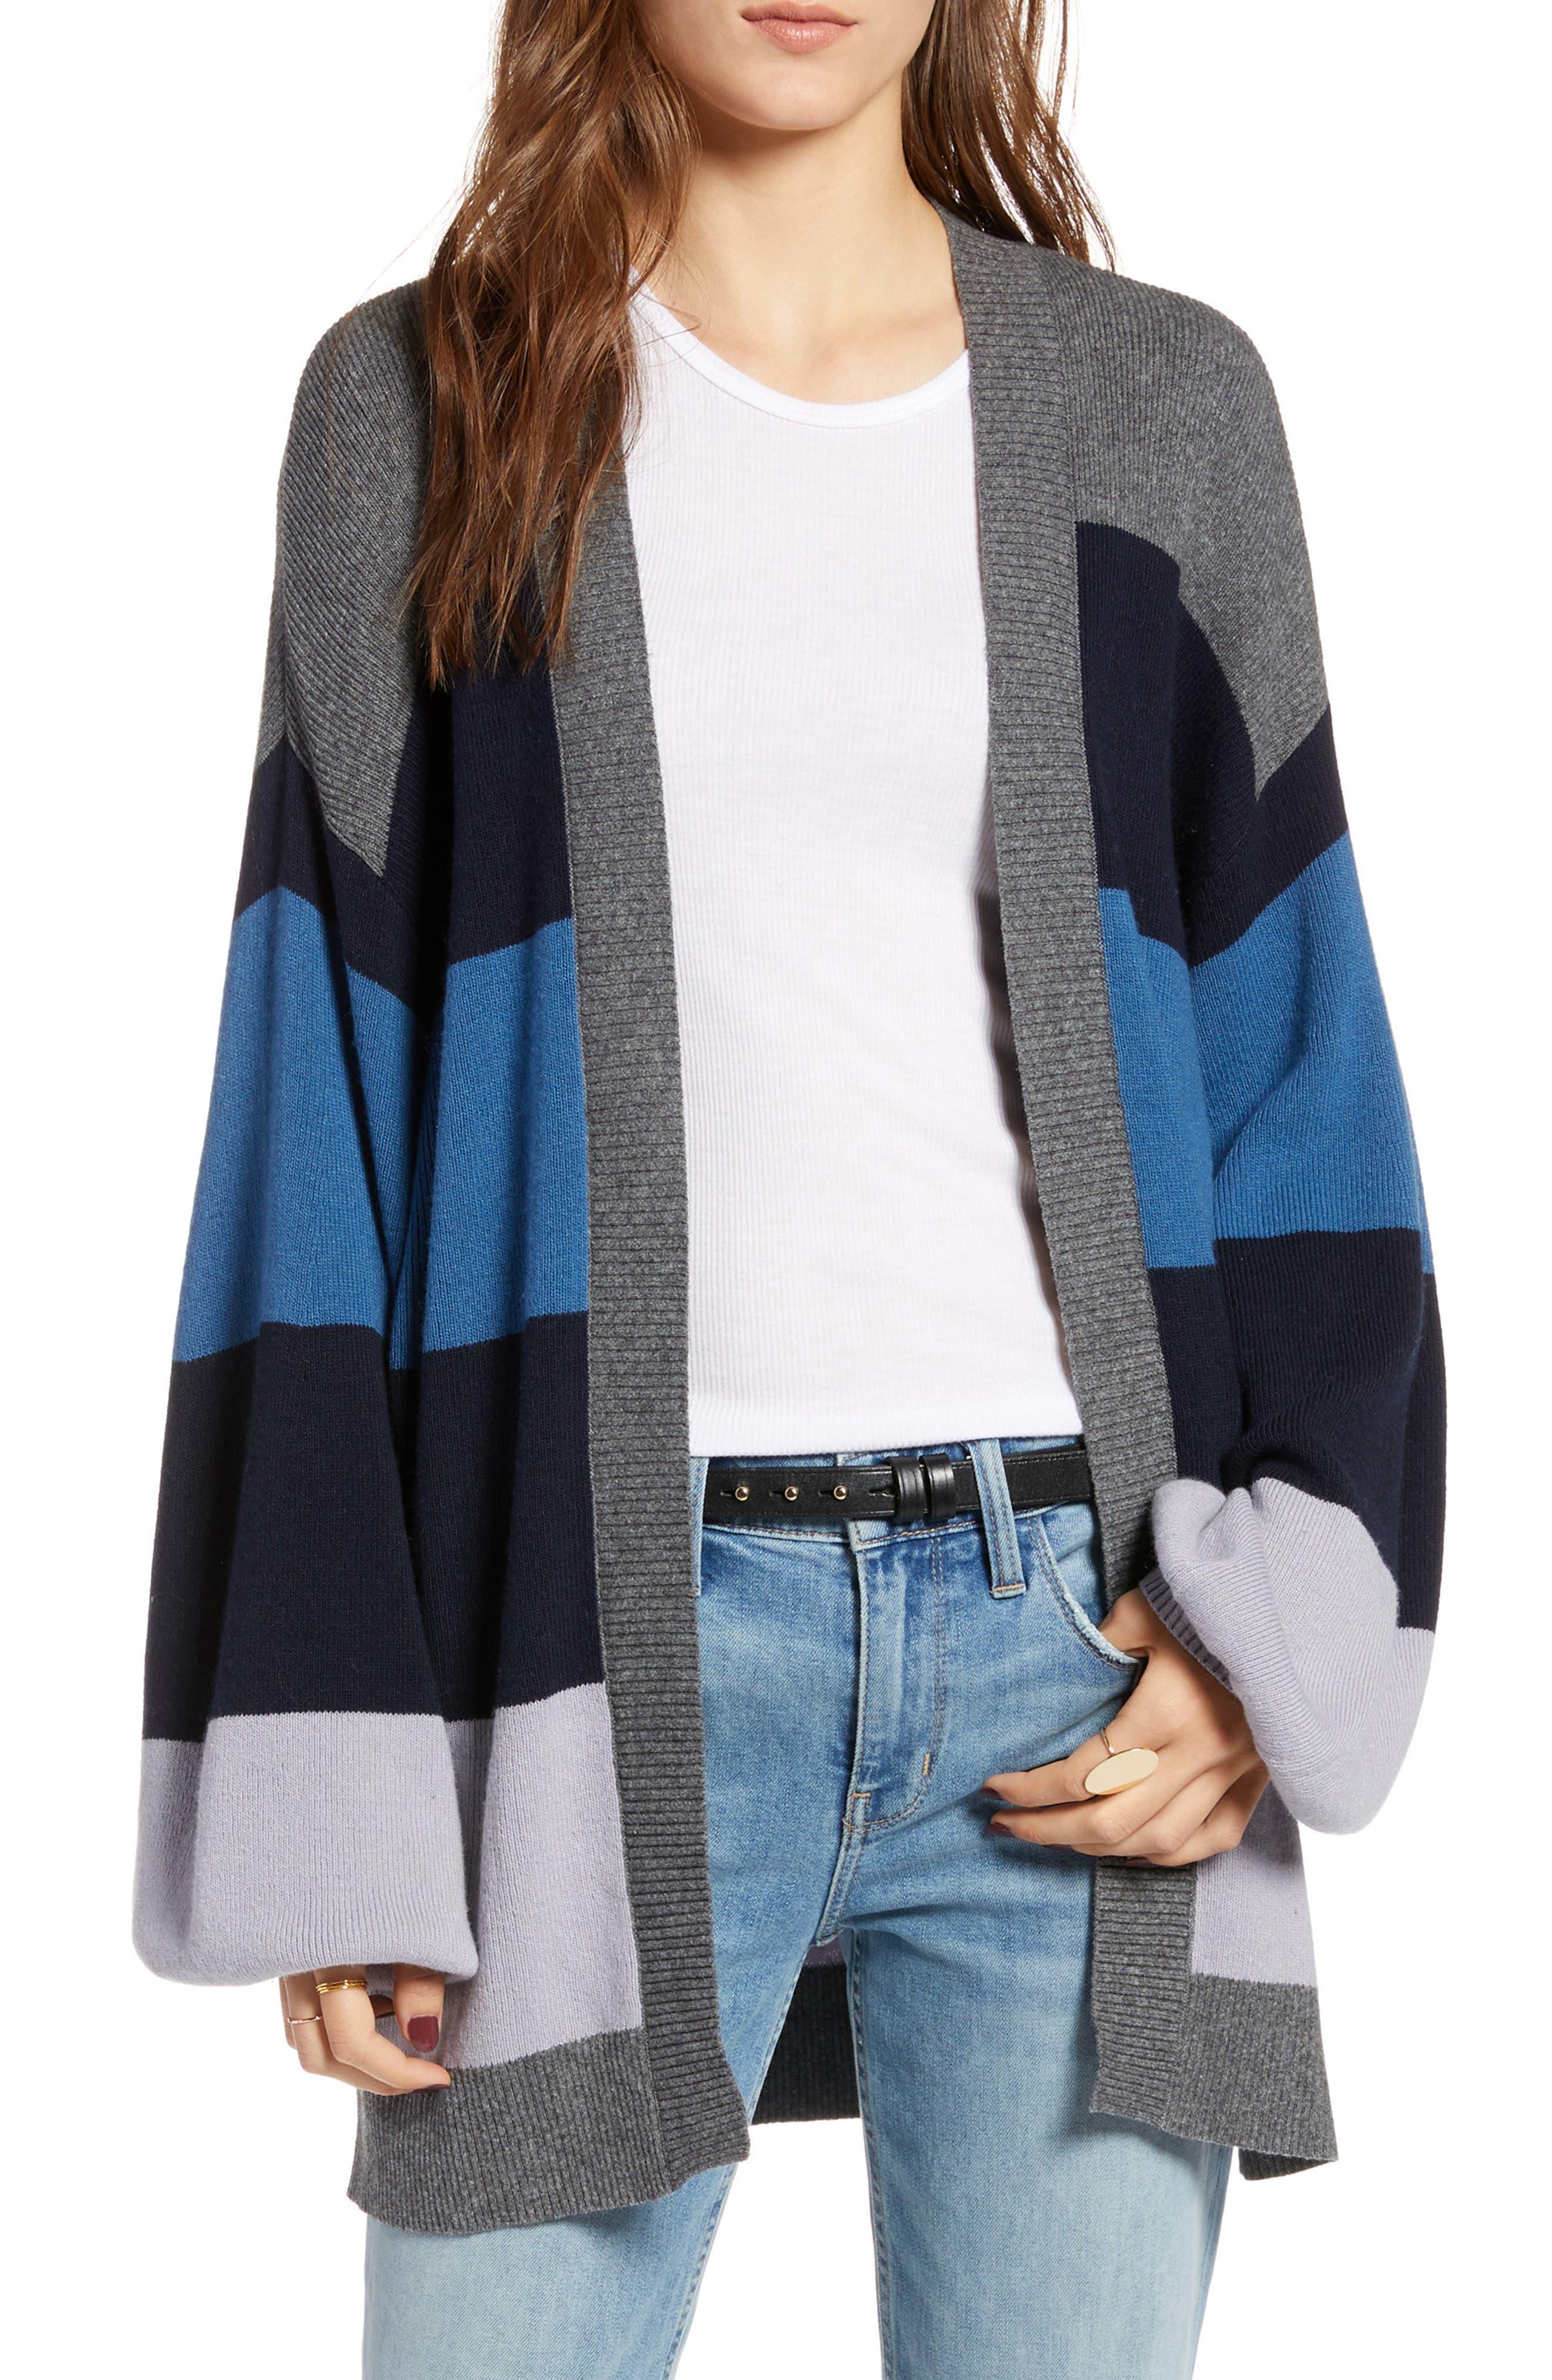 TREASURE & BOND Stripe Cardigan, Main, color, 400